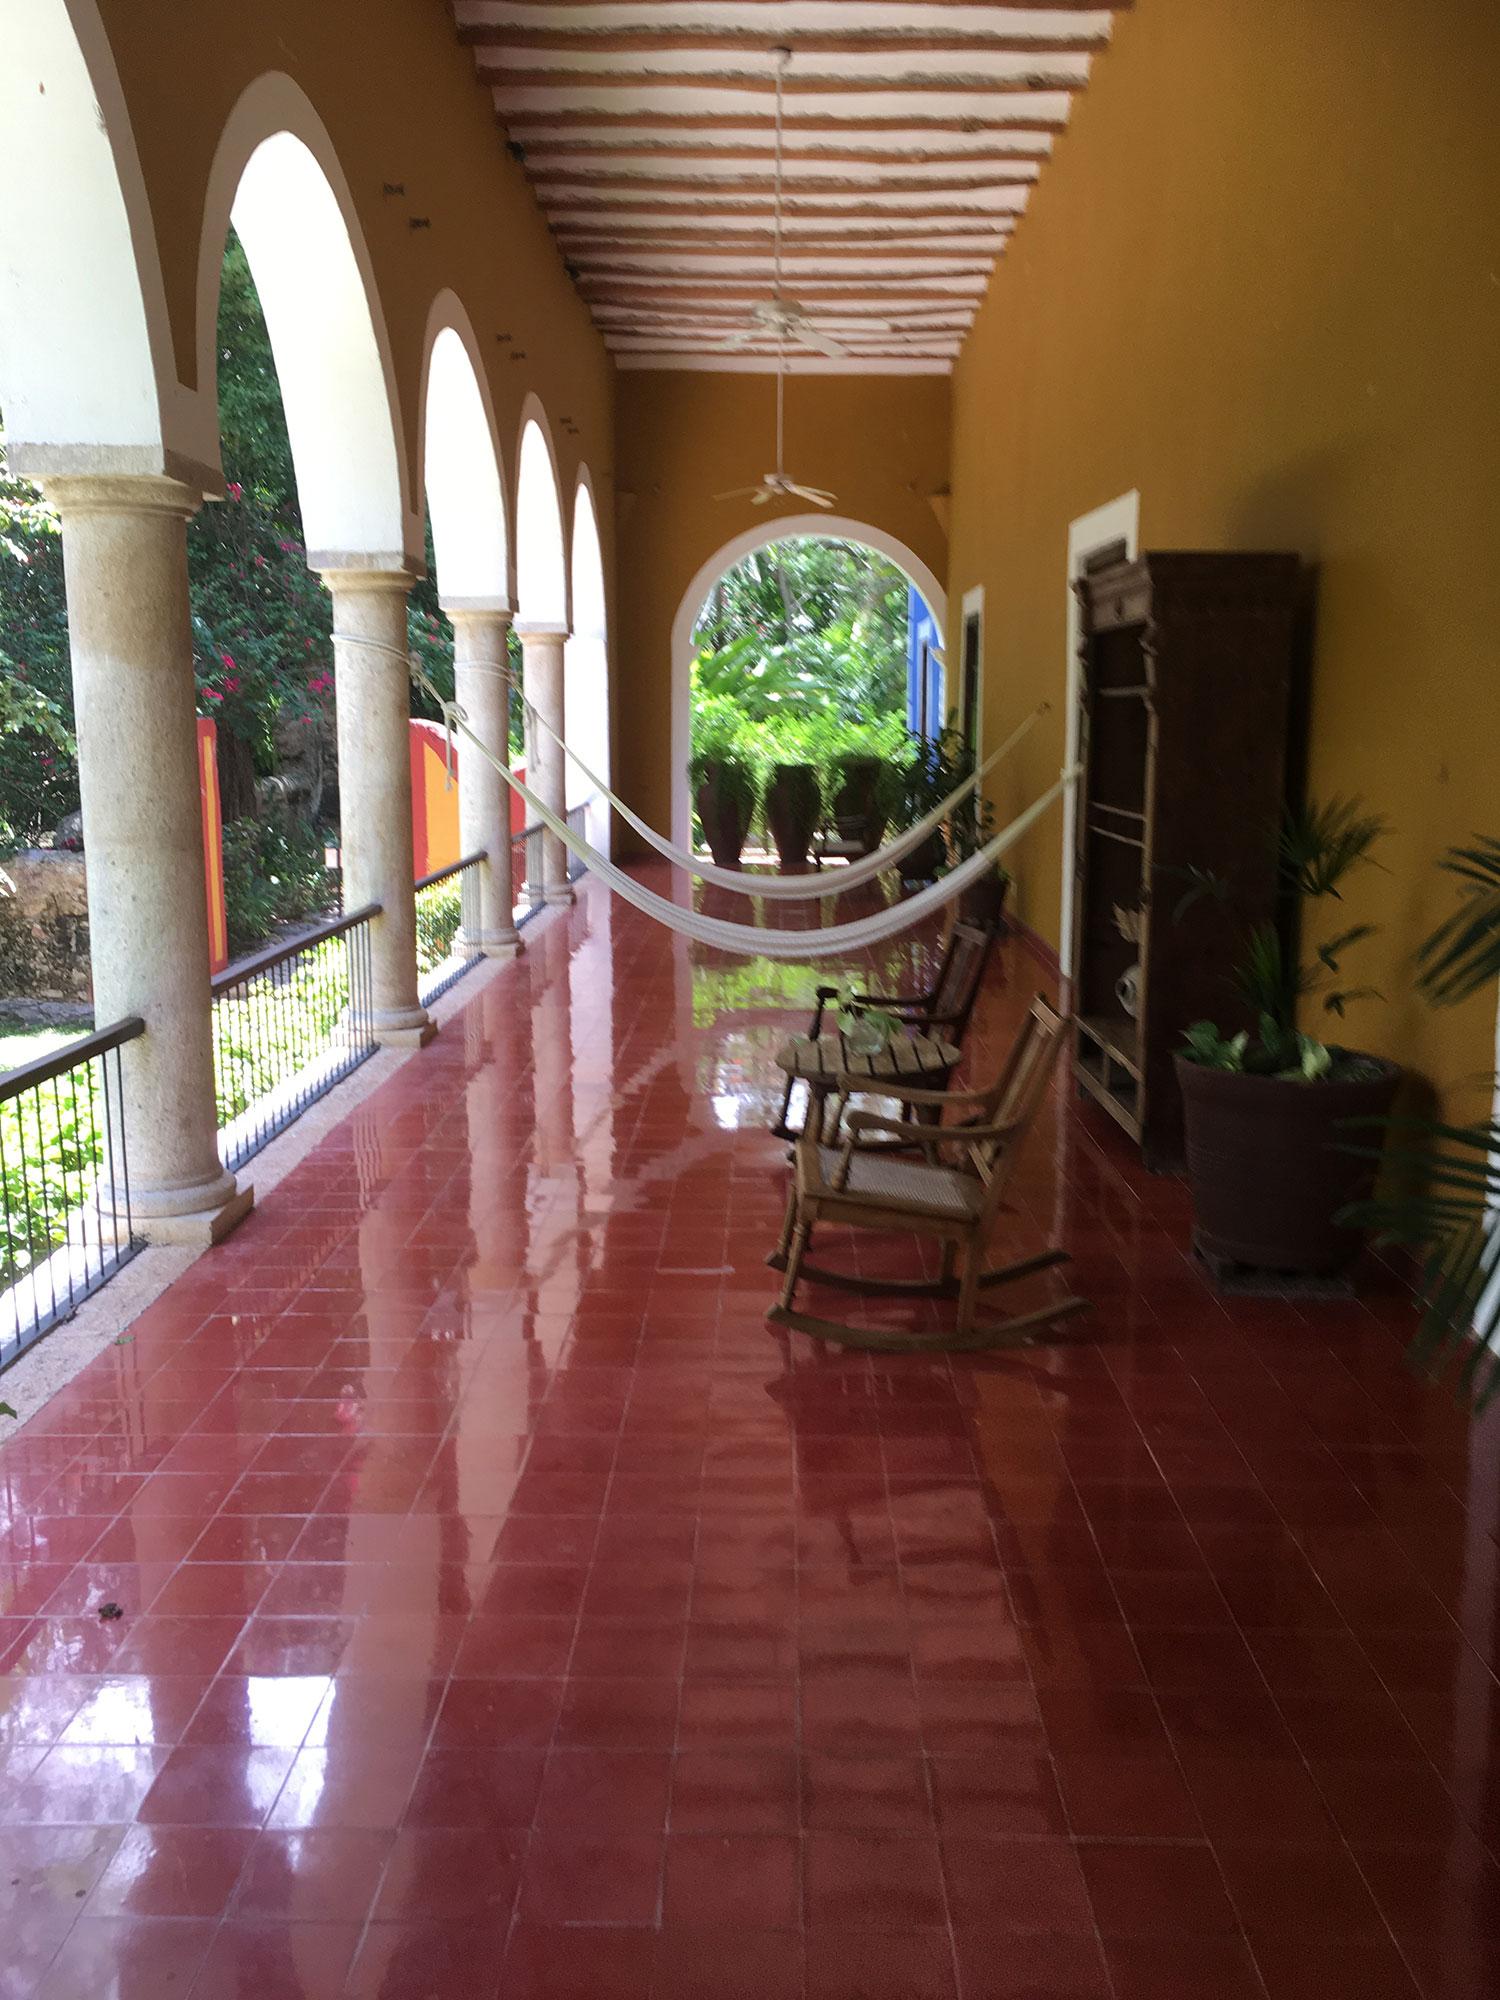 The hotel veranda.